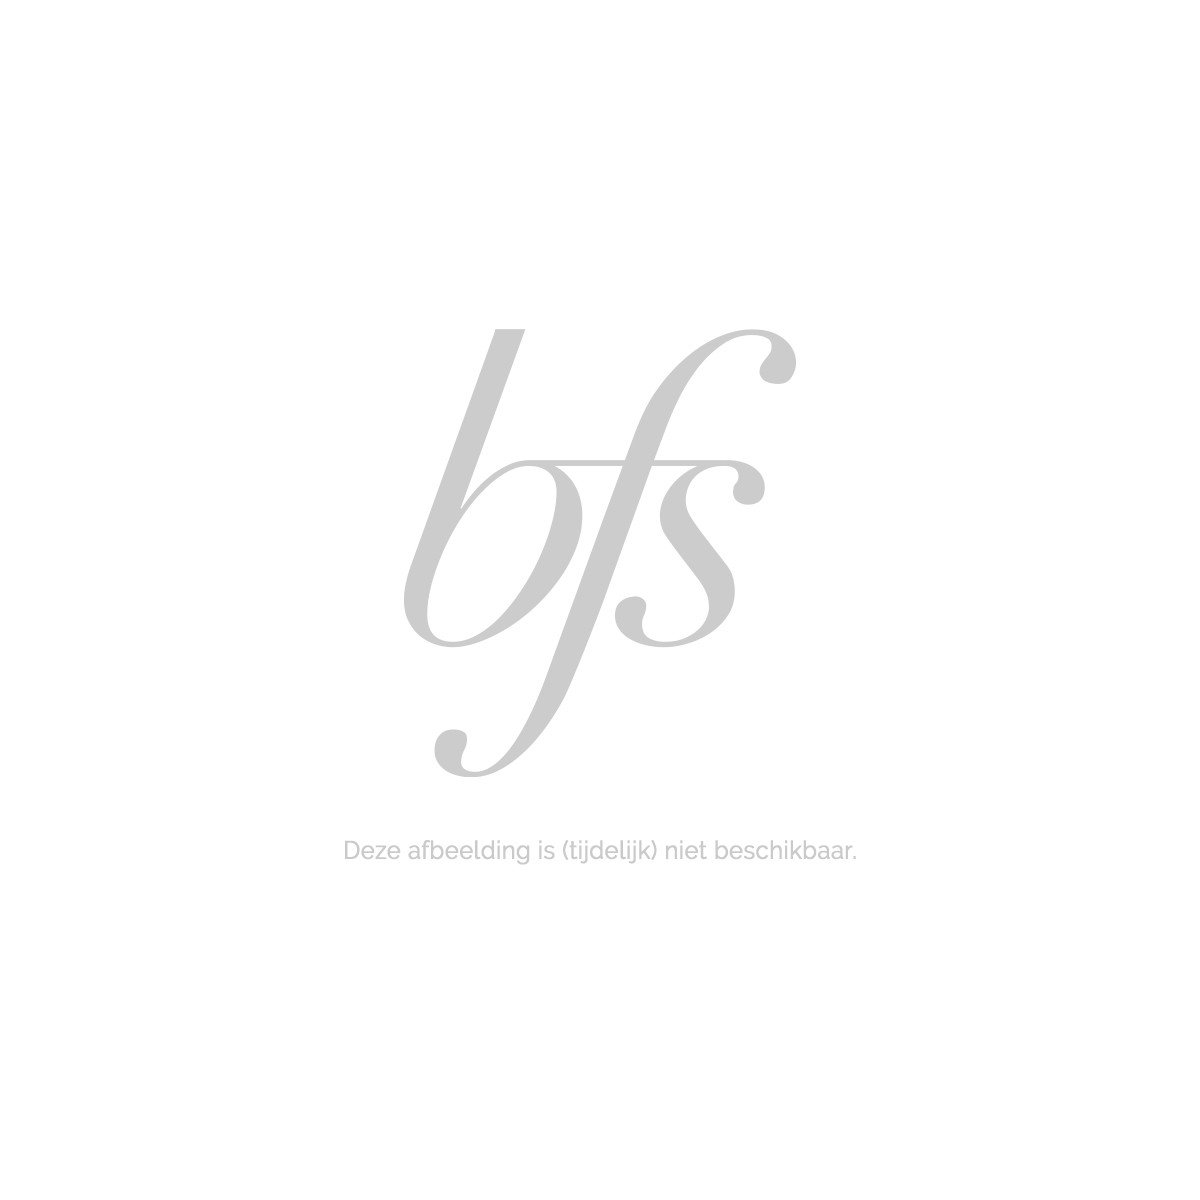 Redken Styling Blowdry Primer 170 Ml